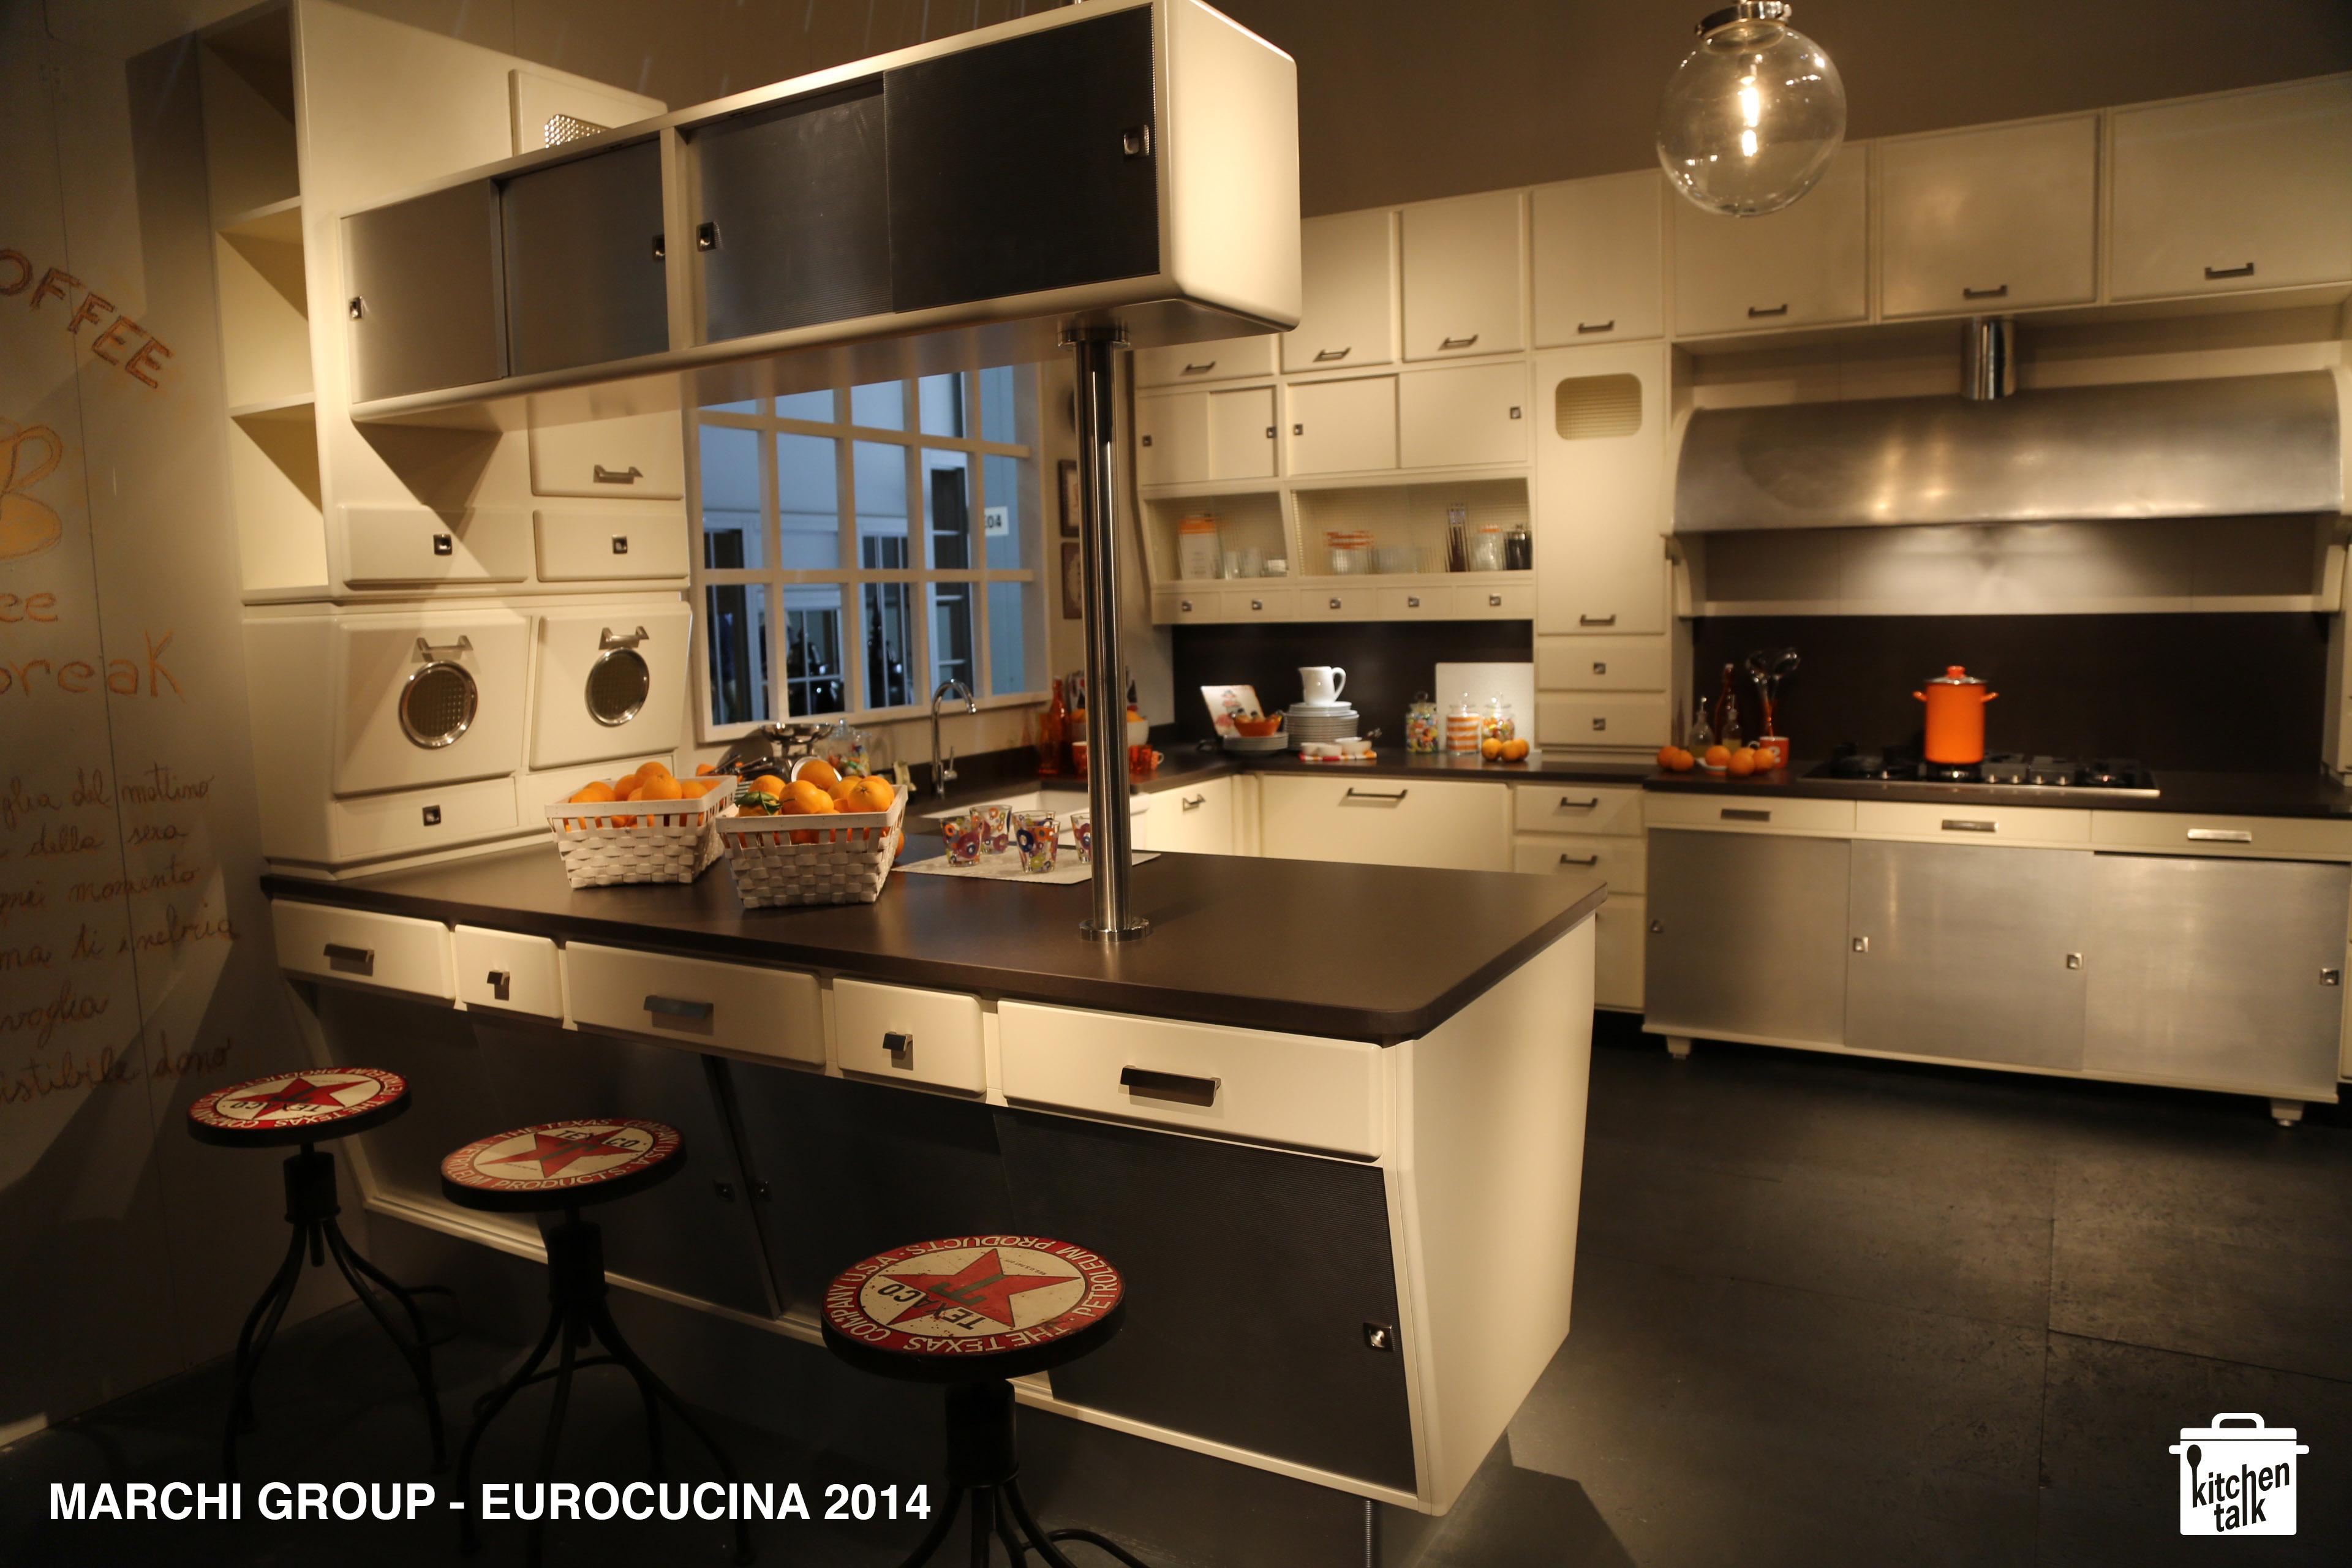 Marchi cucine eurocucina milano 2014 kitchen talk blog - De marchi cucine ...